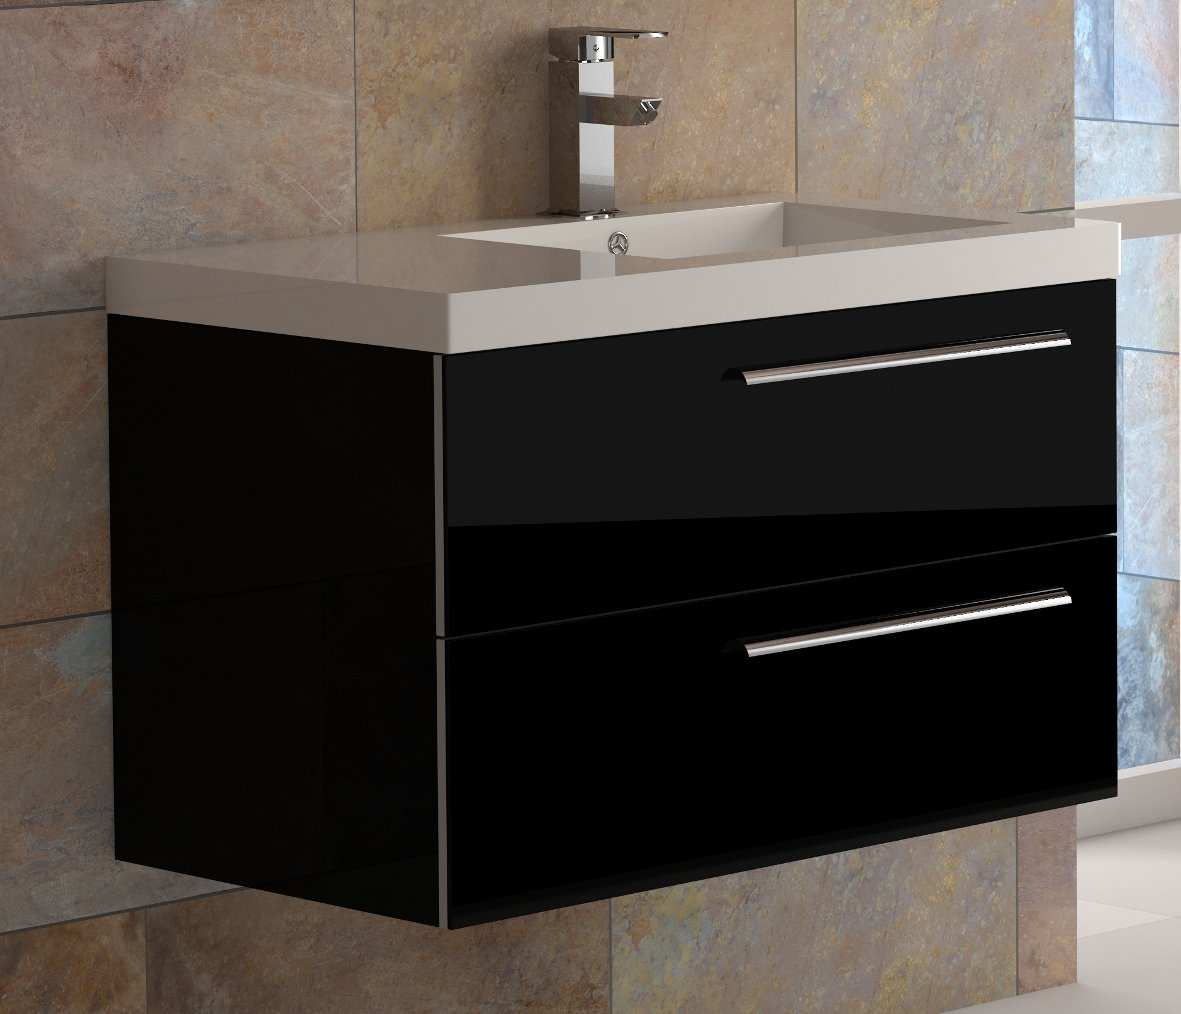 Embellecedores muebles de baño | Embellecedores